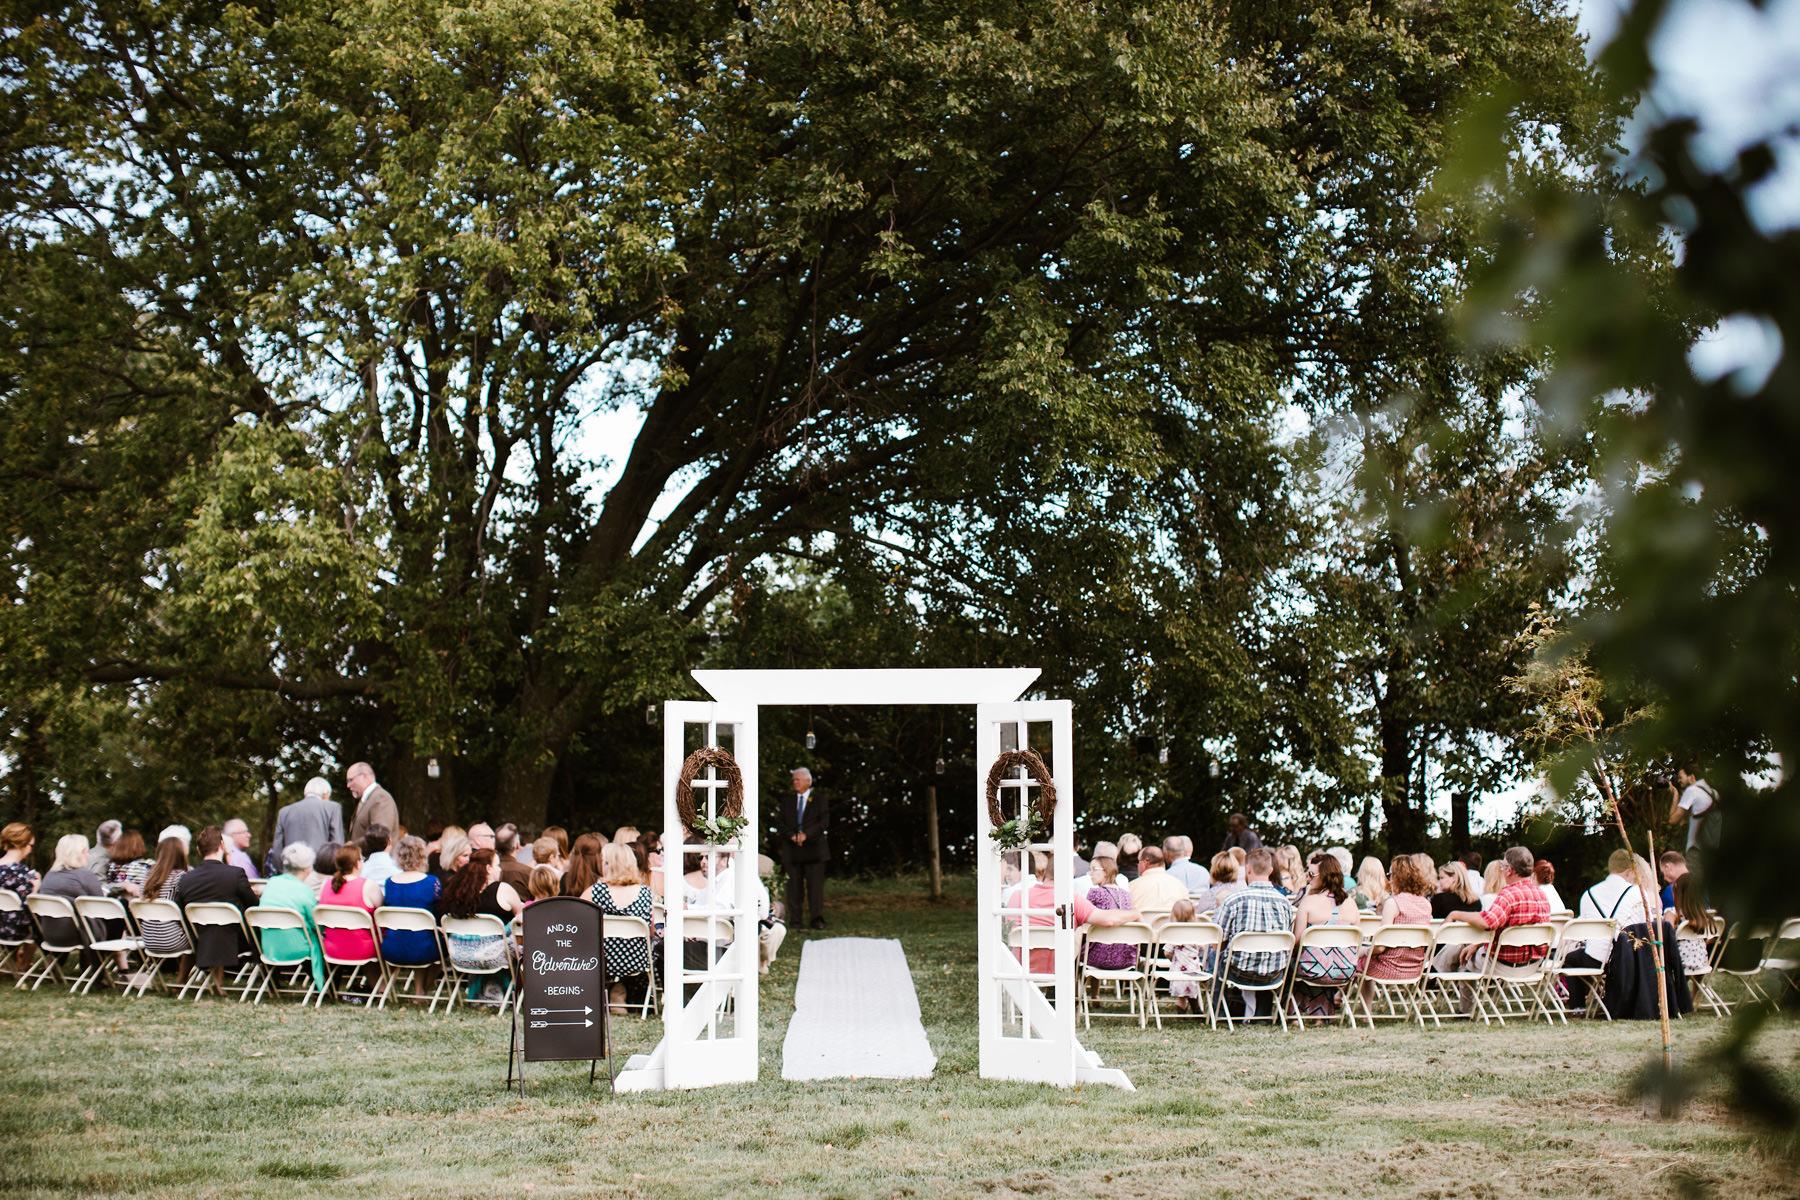 Alldredge Orchard Kansas City_Kindling Wedding Photography BLOG 32.JPG